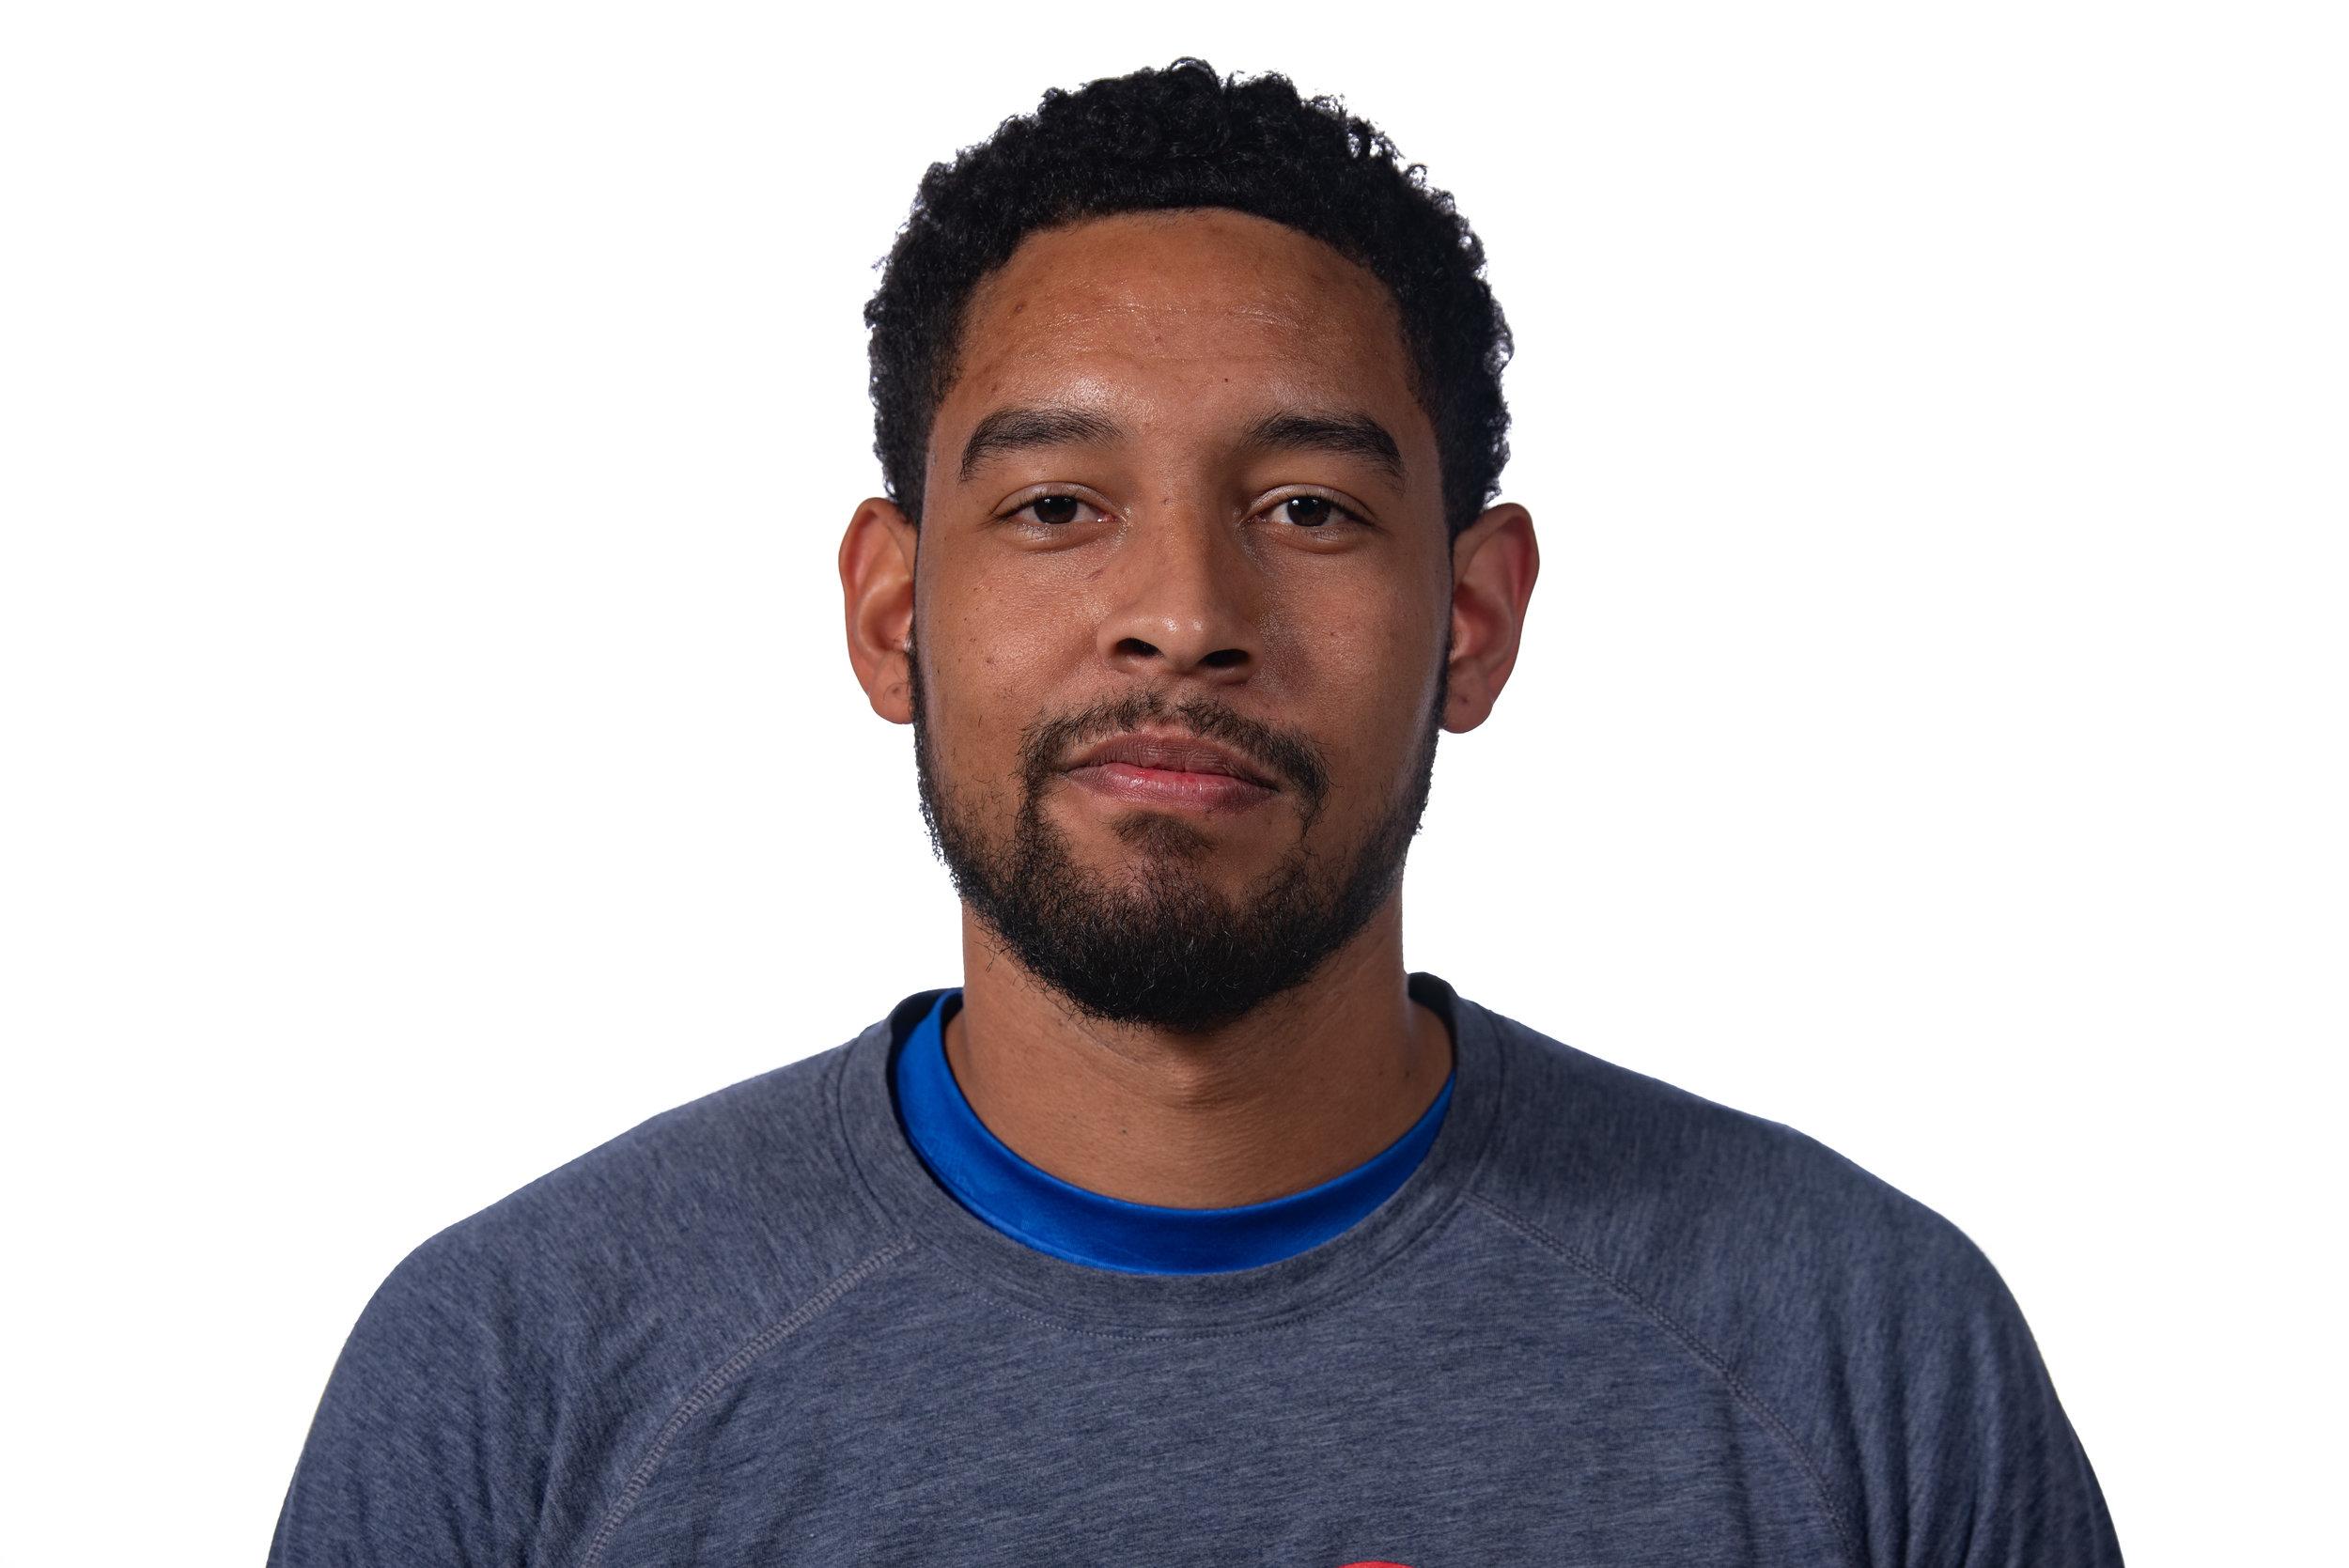 keenan mason - Small Foward/Power ForwardKeenan mason is a 2010 graduate of evans high school where he starred in basketball.